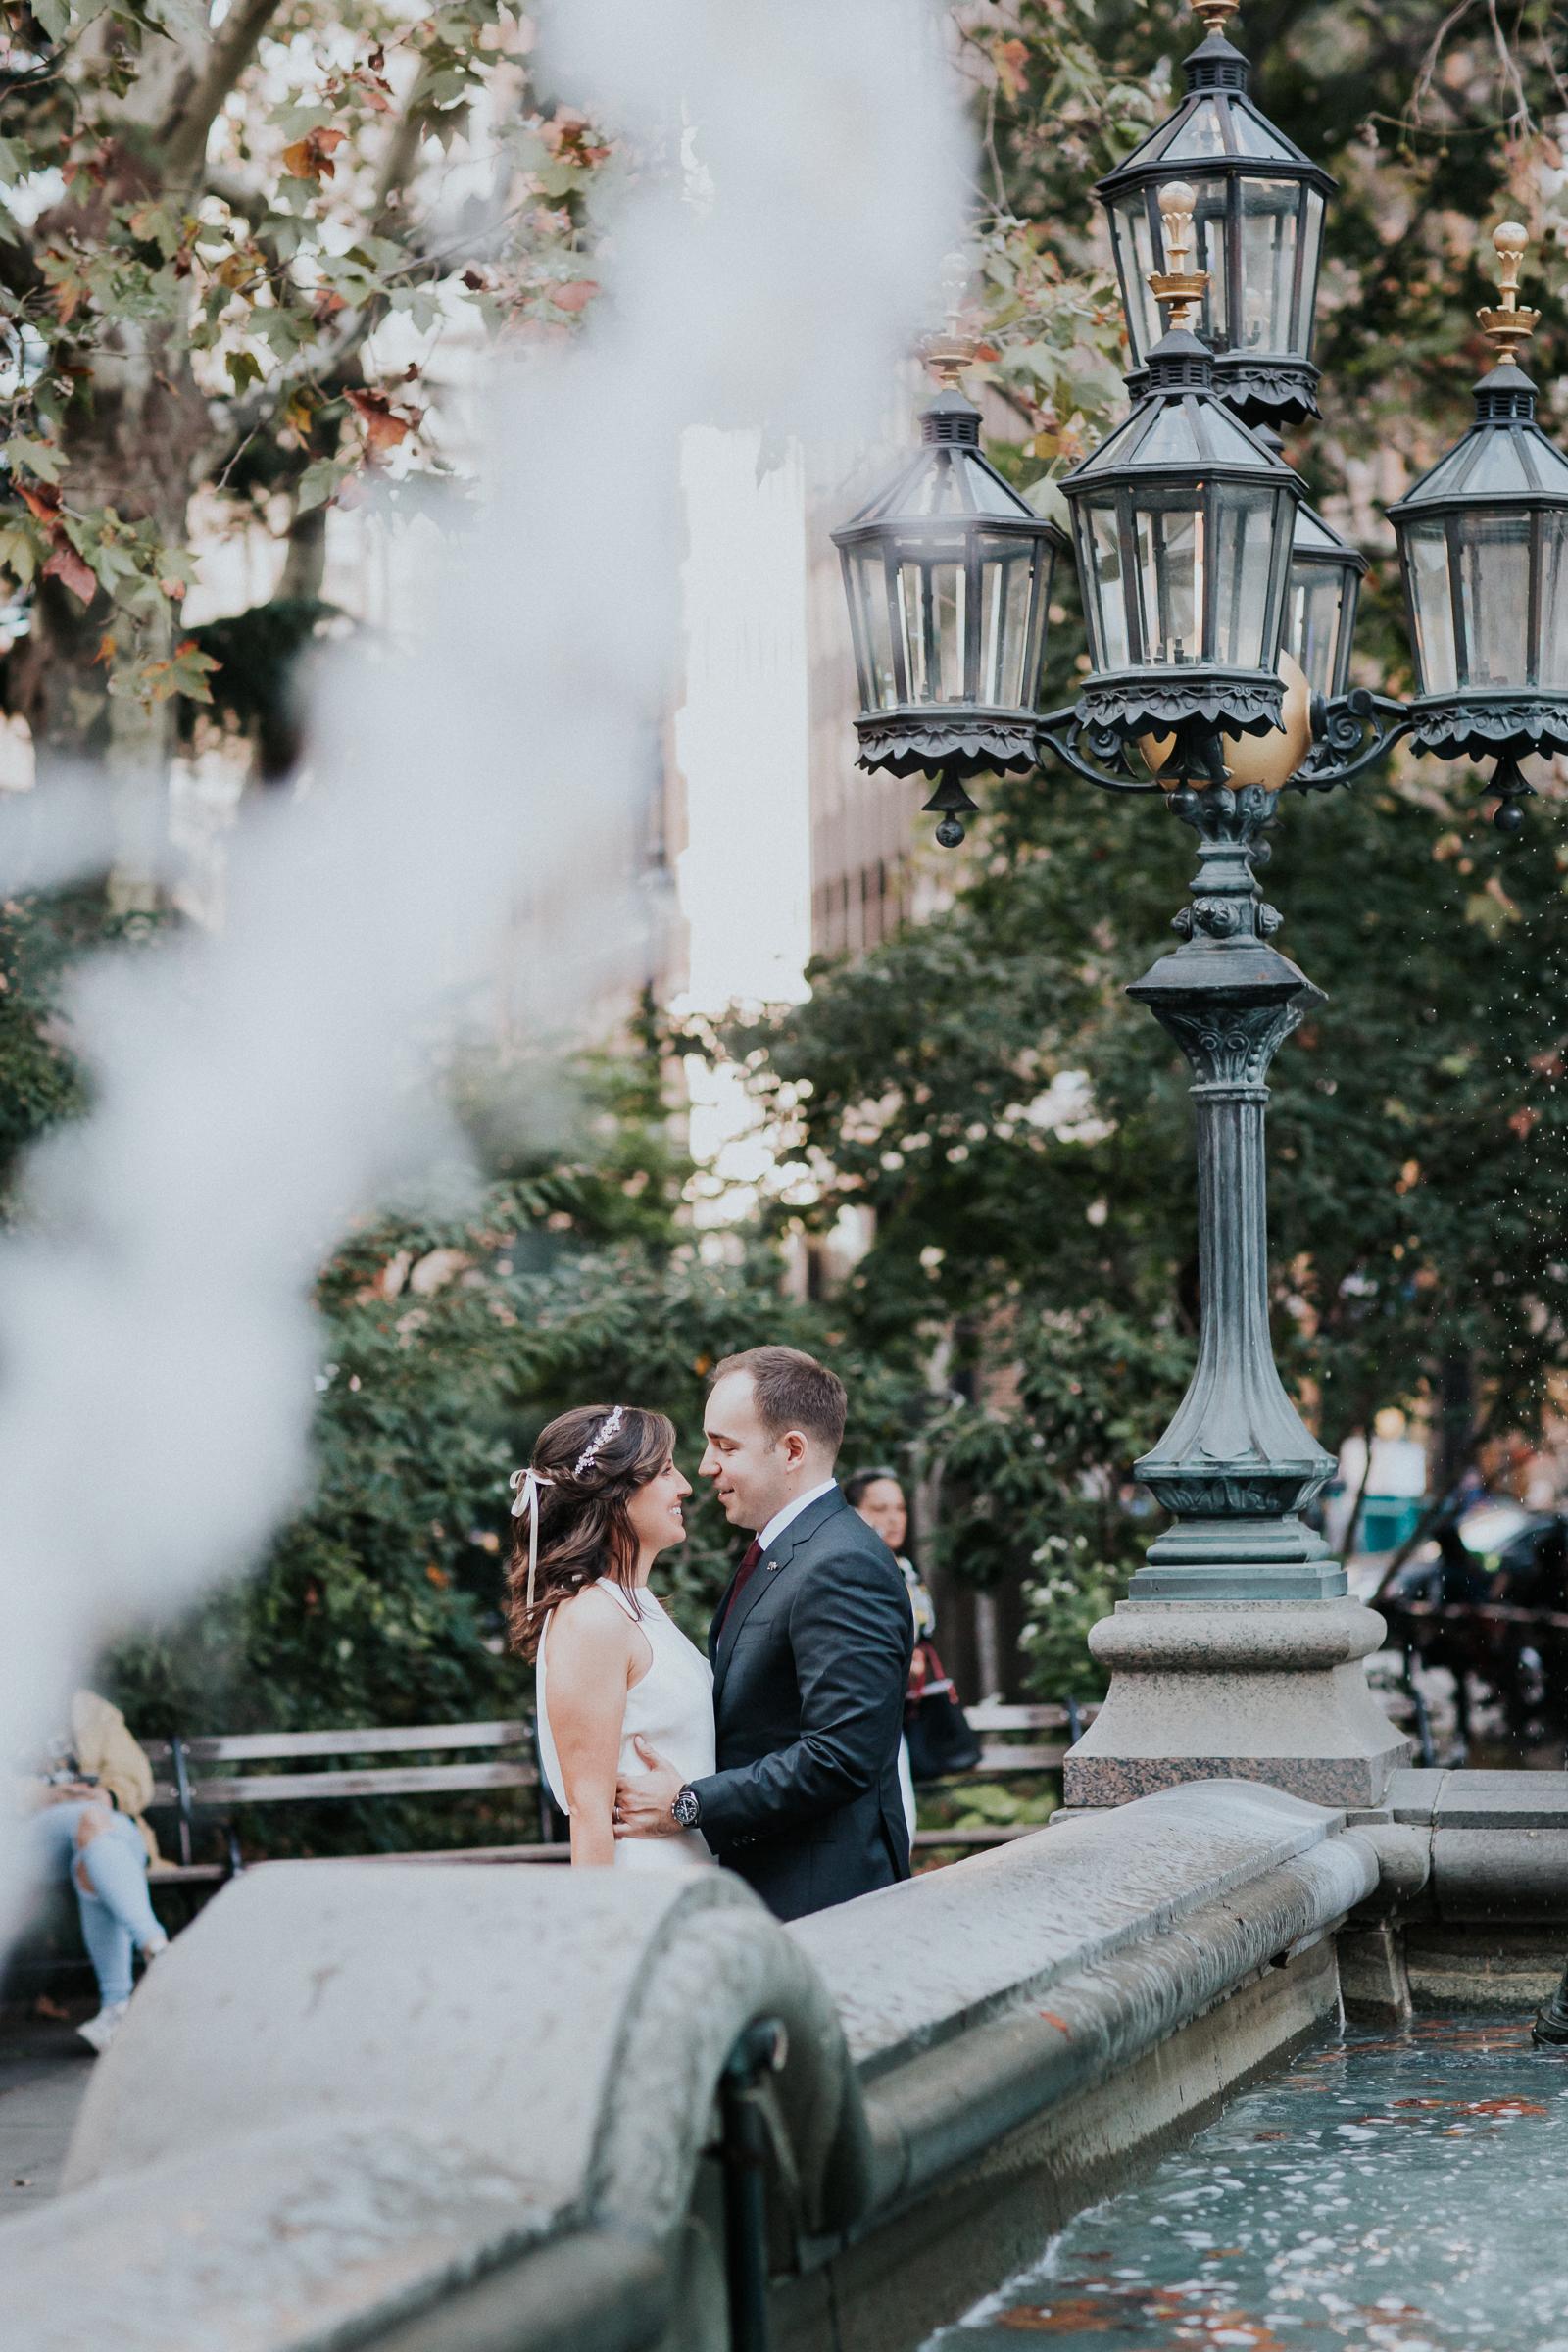 Casa-Apicii-Intimate-Wedding-City-Hall-Elopement-New-York-Documentary-Wedding-Photographer-27.jpg